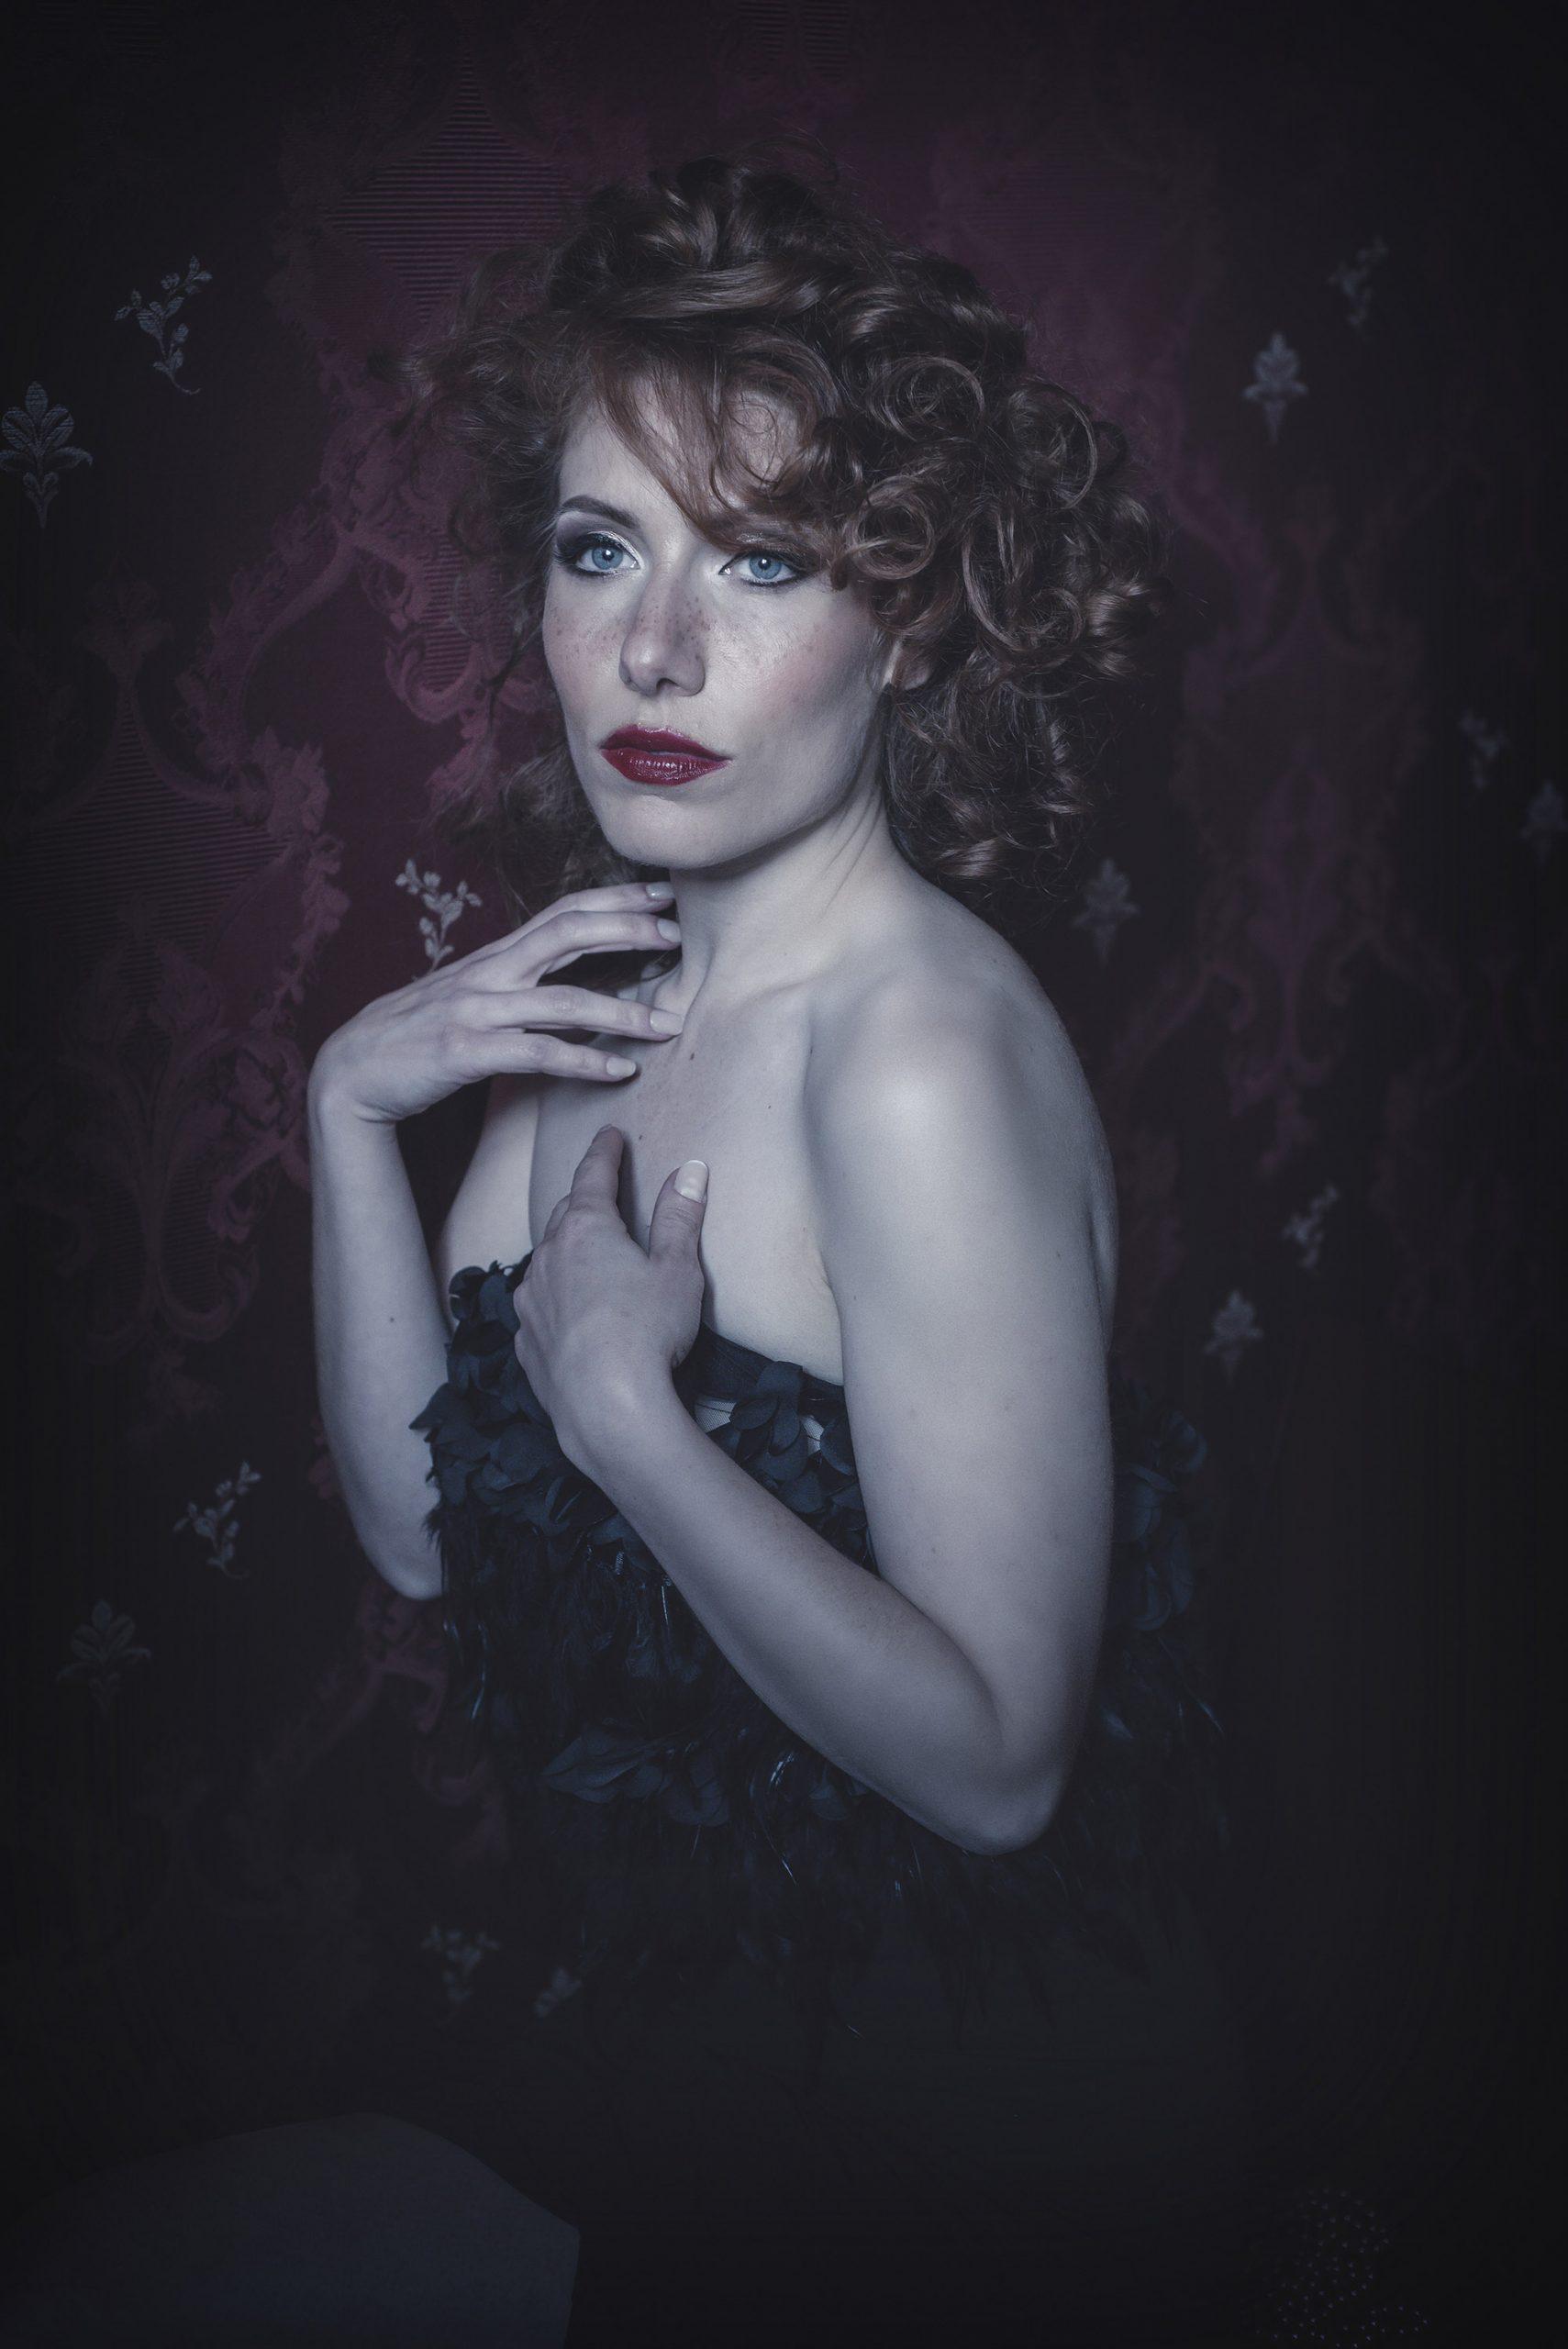 Categorie: Fashion, Fine Art, Portrait - Photographer: STEFANIA RIGO - Model: ANNA TOMASI - Mua: CHIARA CASTALDI - Master: ANDREA SCHALLSCHMIDT & LAURA ZAMBELLI - Location: Venezia, VE, Italia